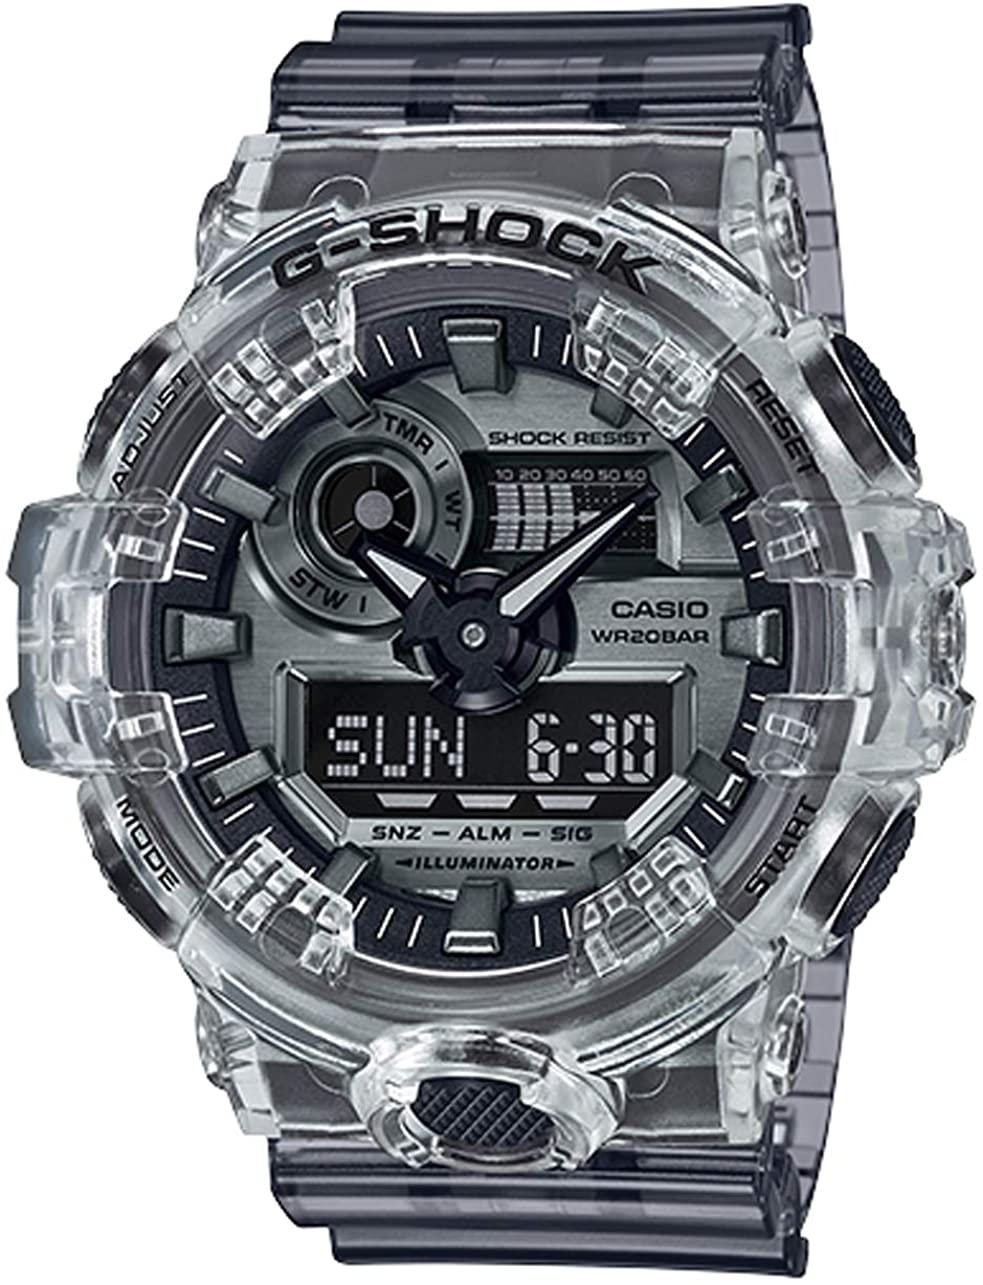 Casio: G Shock Digital Multi Function Watch  Name Of Bracelet: Ad Resin Skeleton Dial Color: Silver